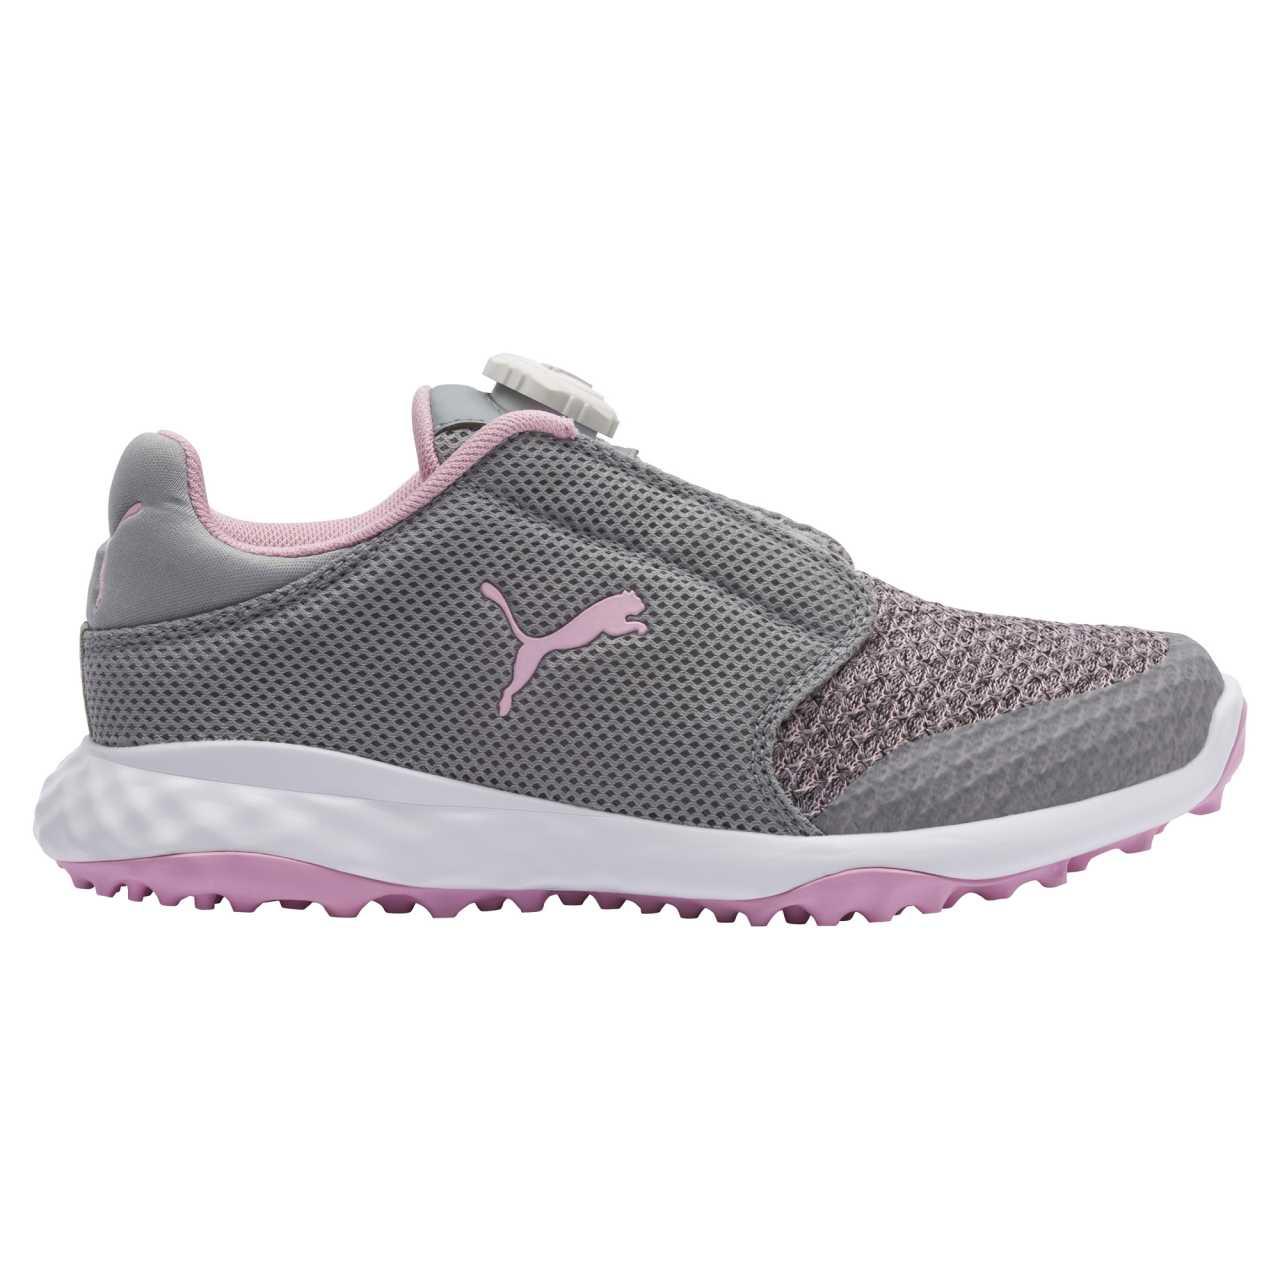 Puma Grip Fusion Sport BOA Junior grau/pink